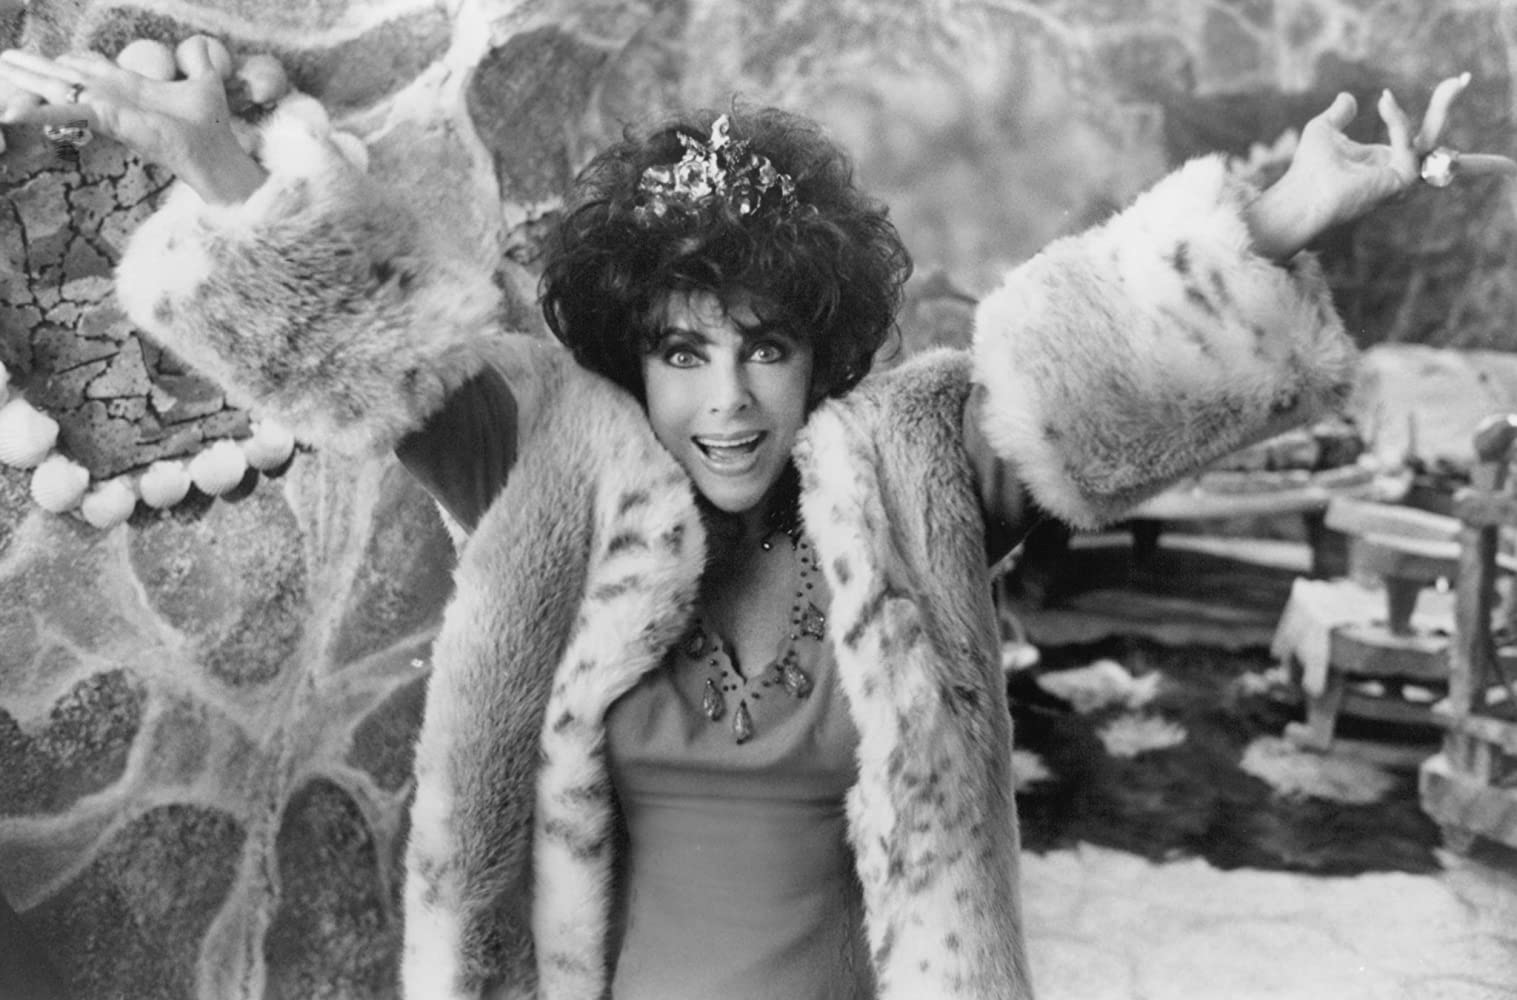 Elizabeth Taylor in The Flintstones (1994)